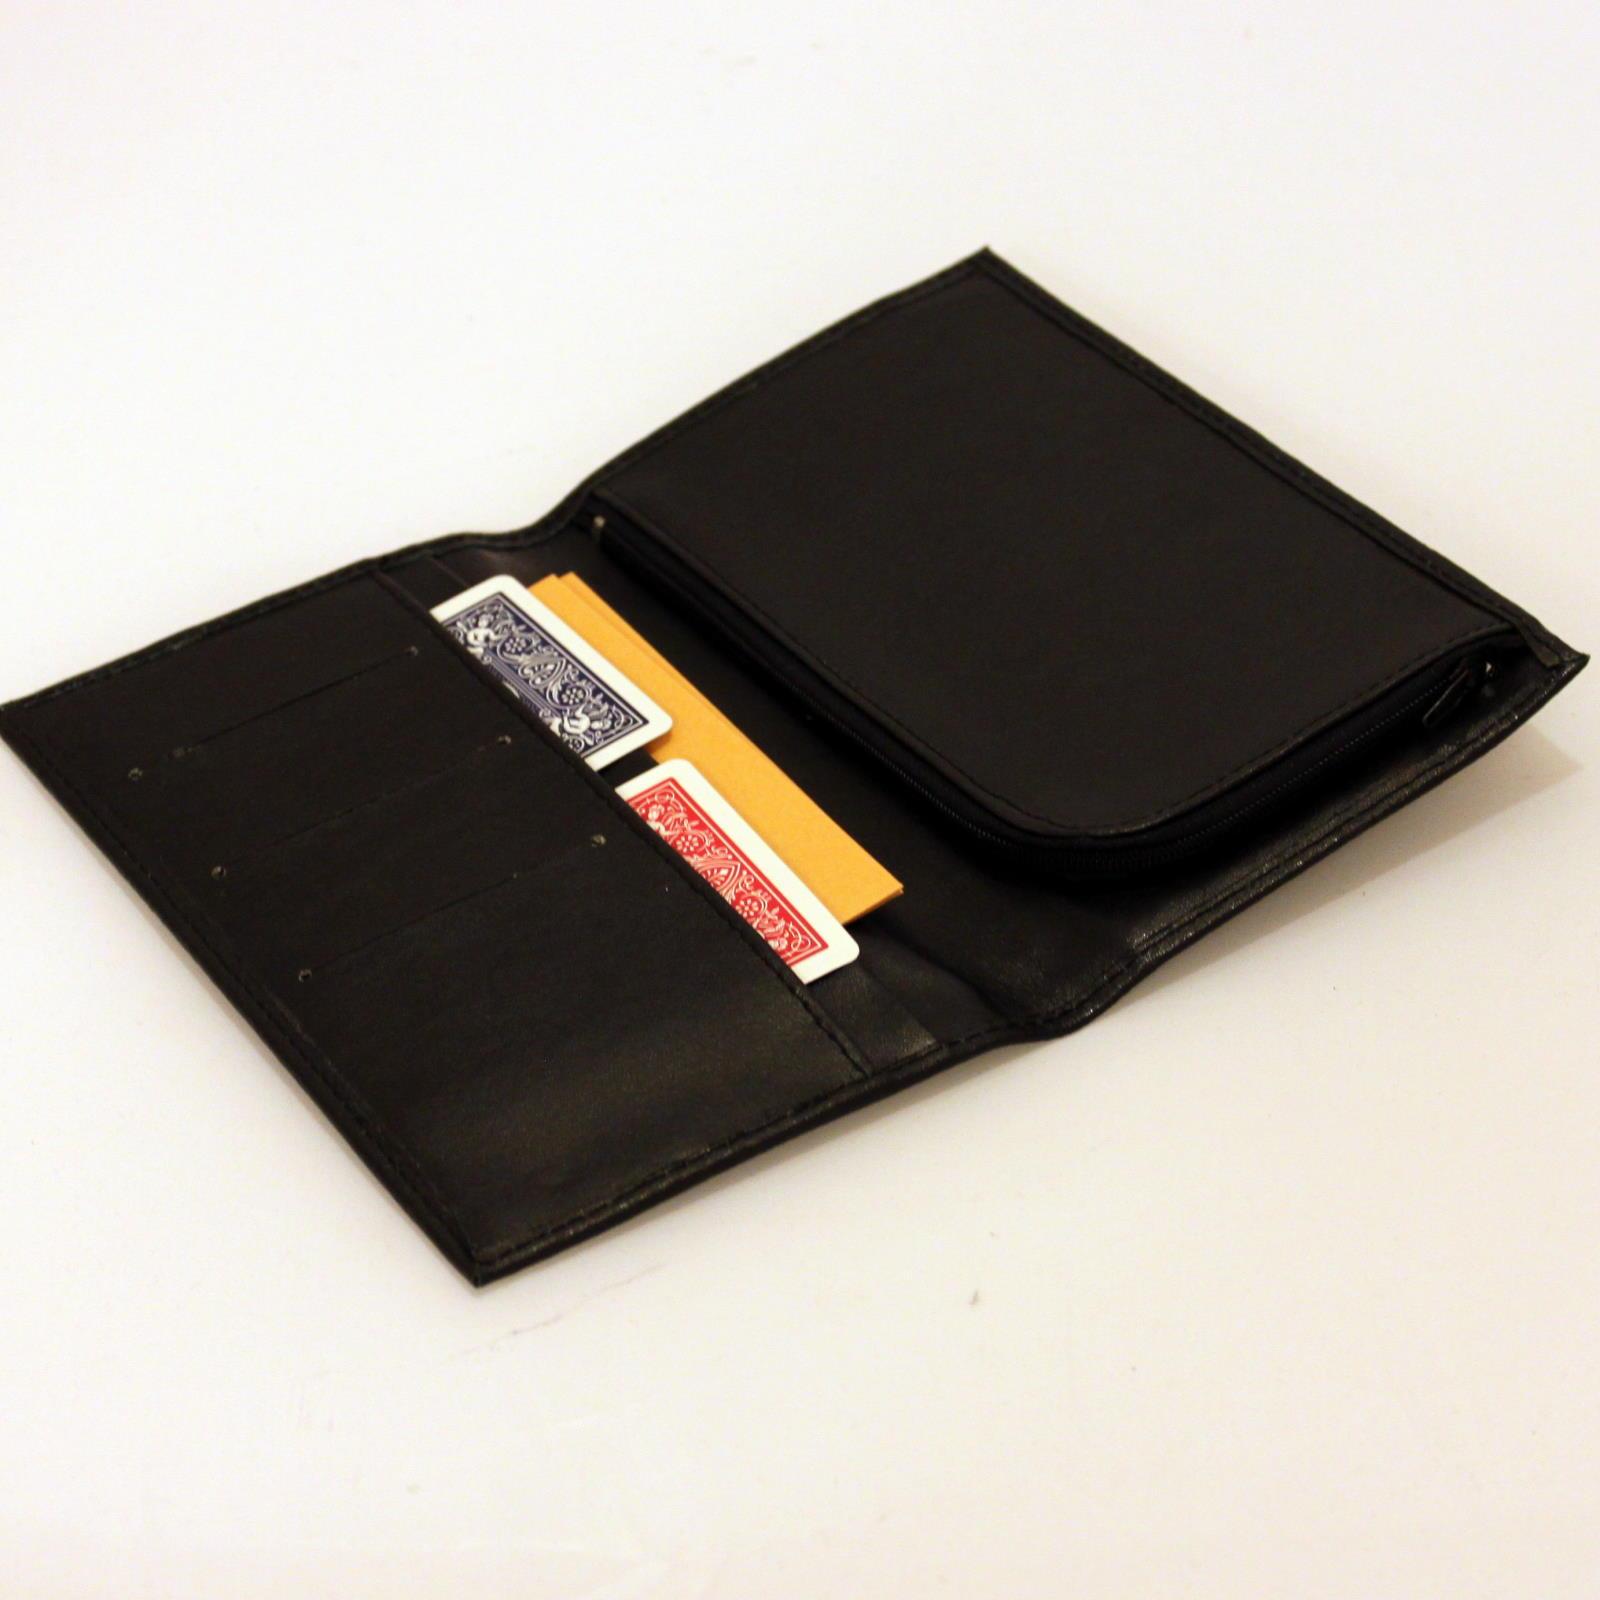 Card In Sealed Envelope in Wallet by Bob Swadling